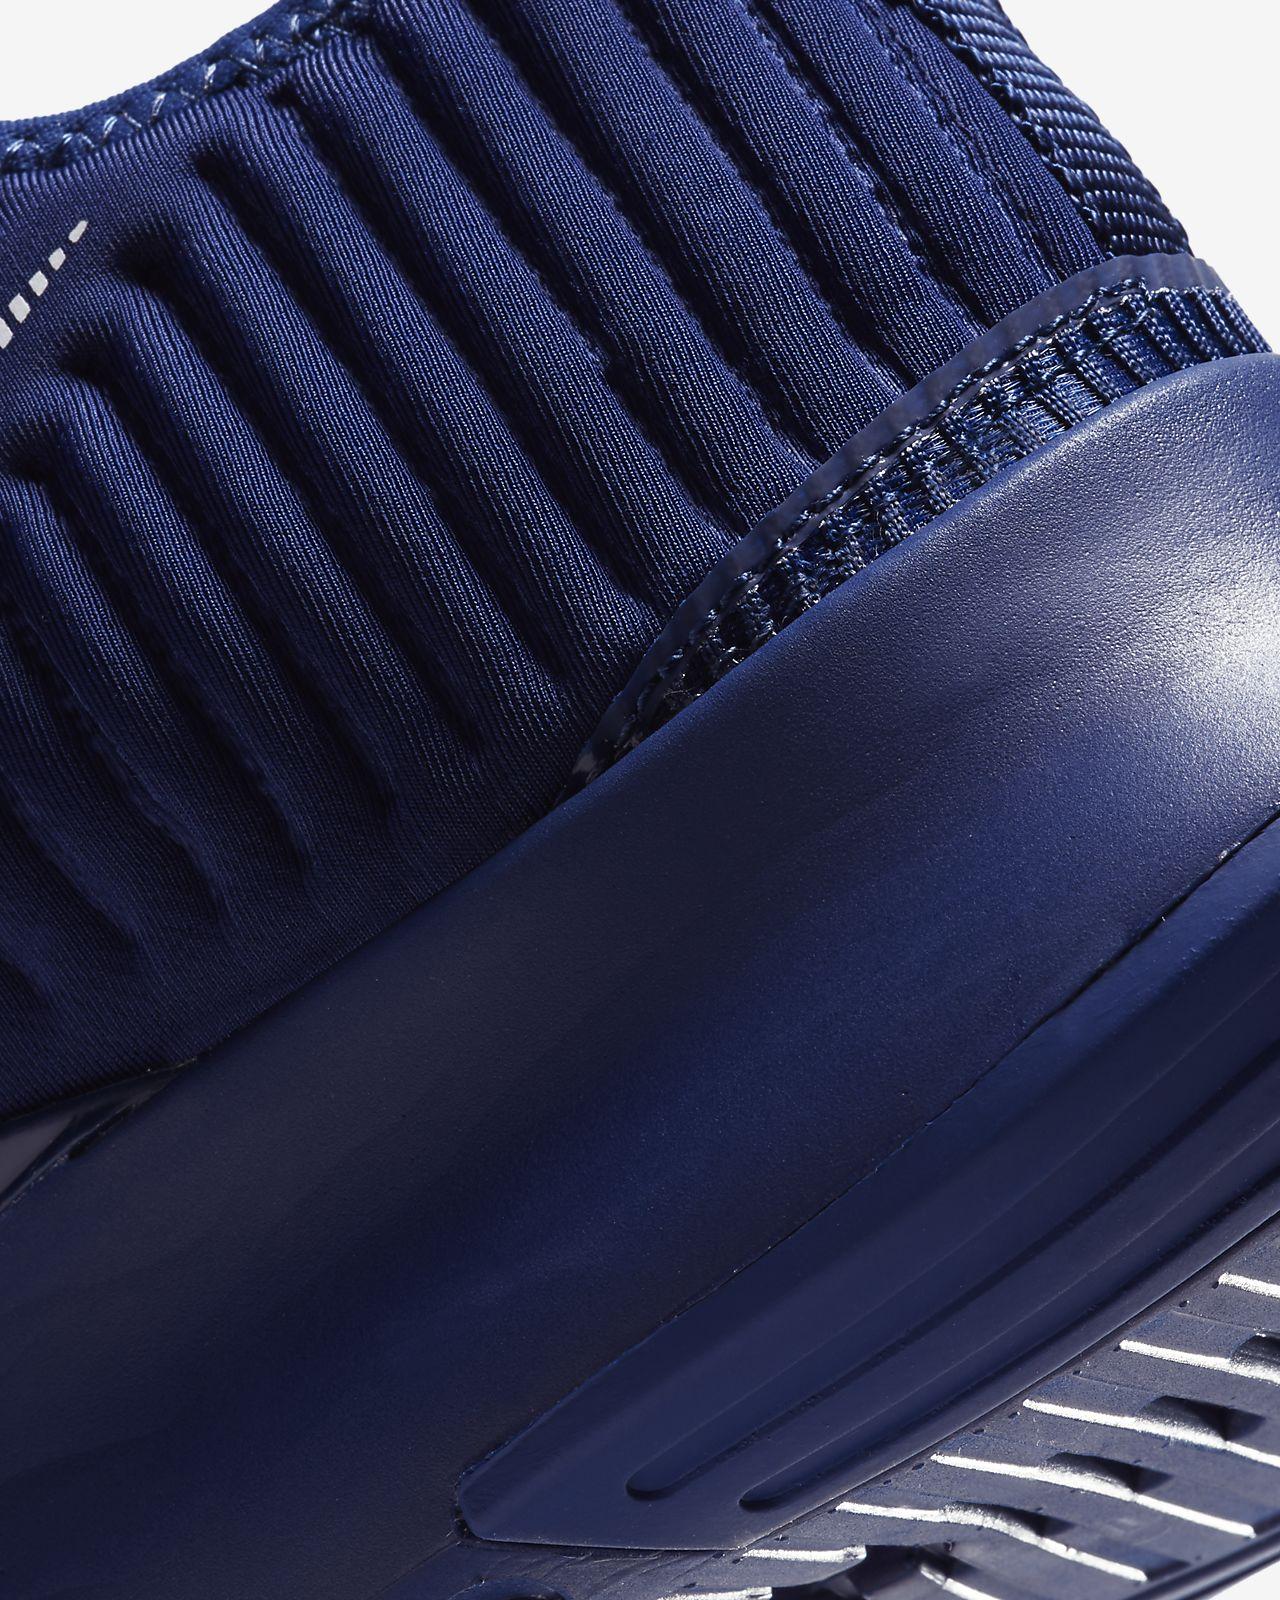 Nike Vomero 14 Men's Running Shoes PurpleBlack